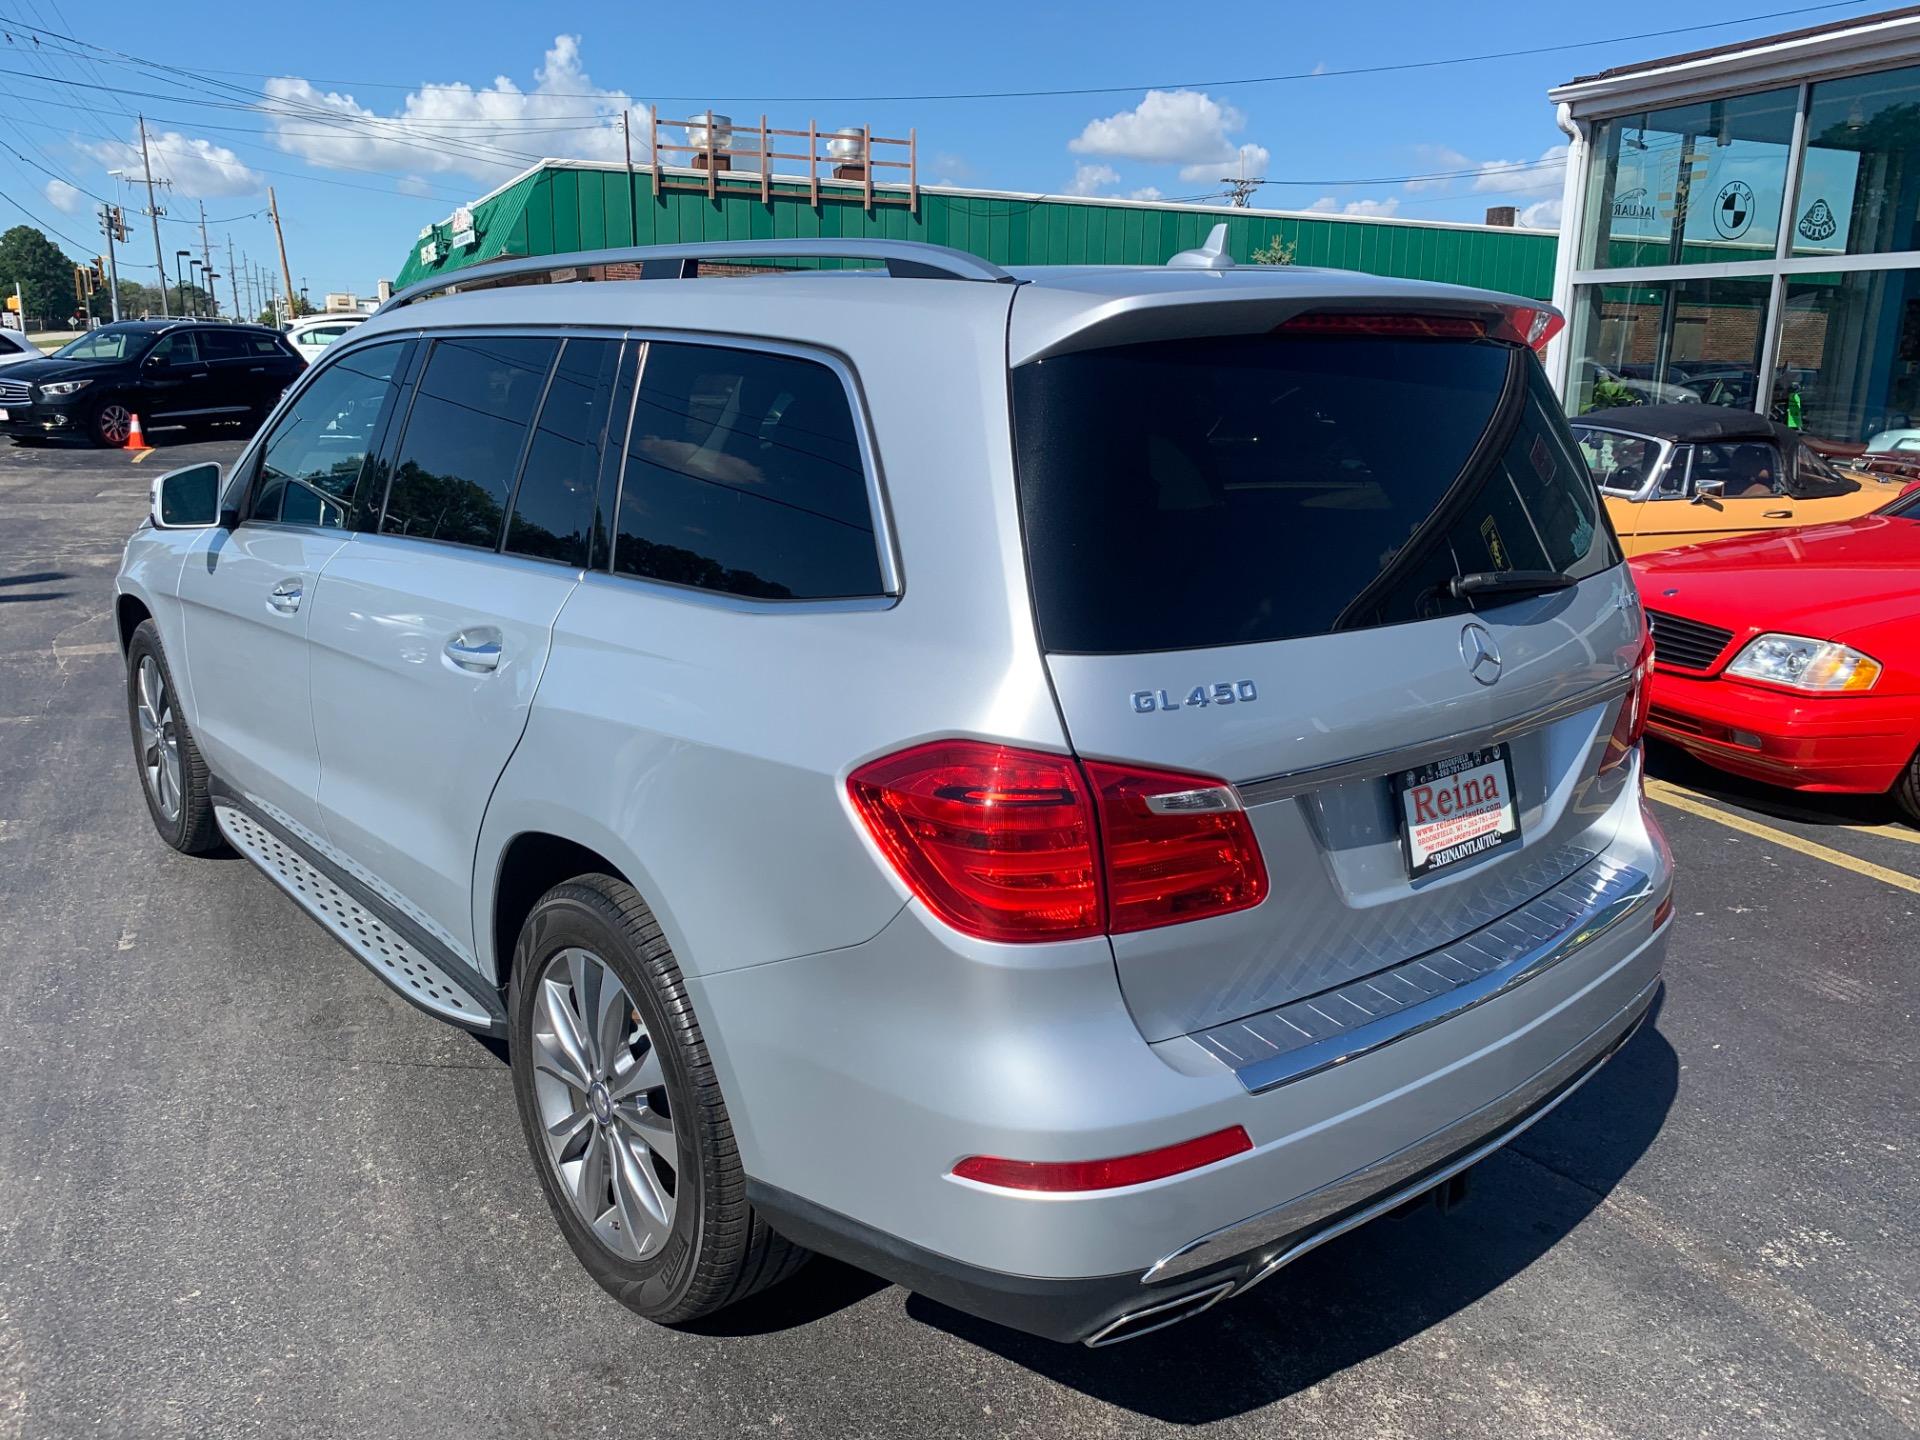 Used-2014-Mercedes-Benz-GL-450-4MATIC